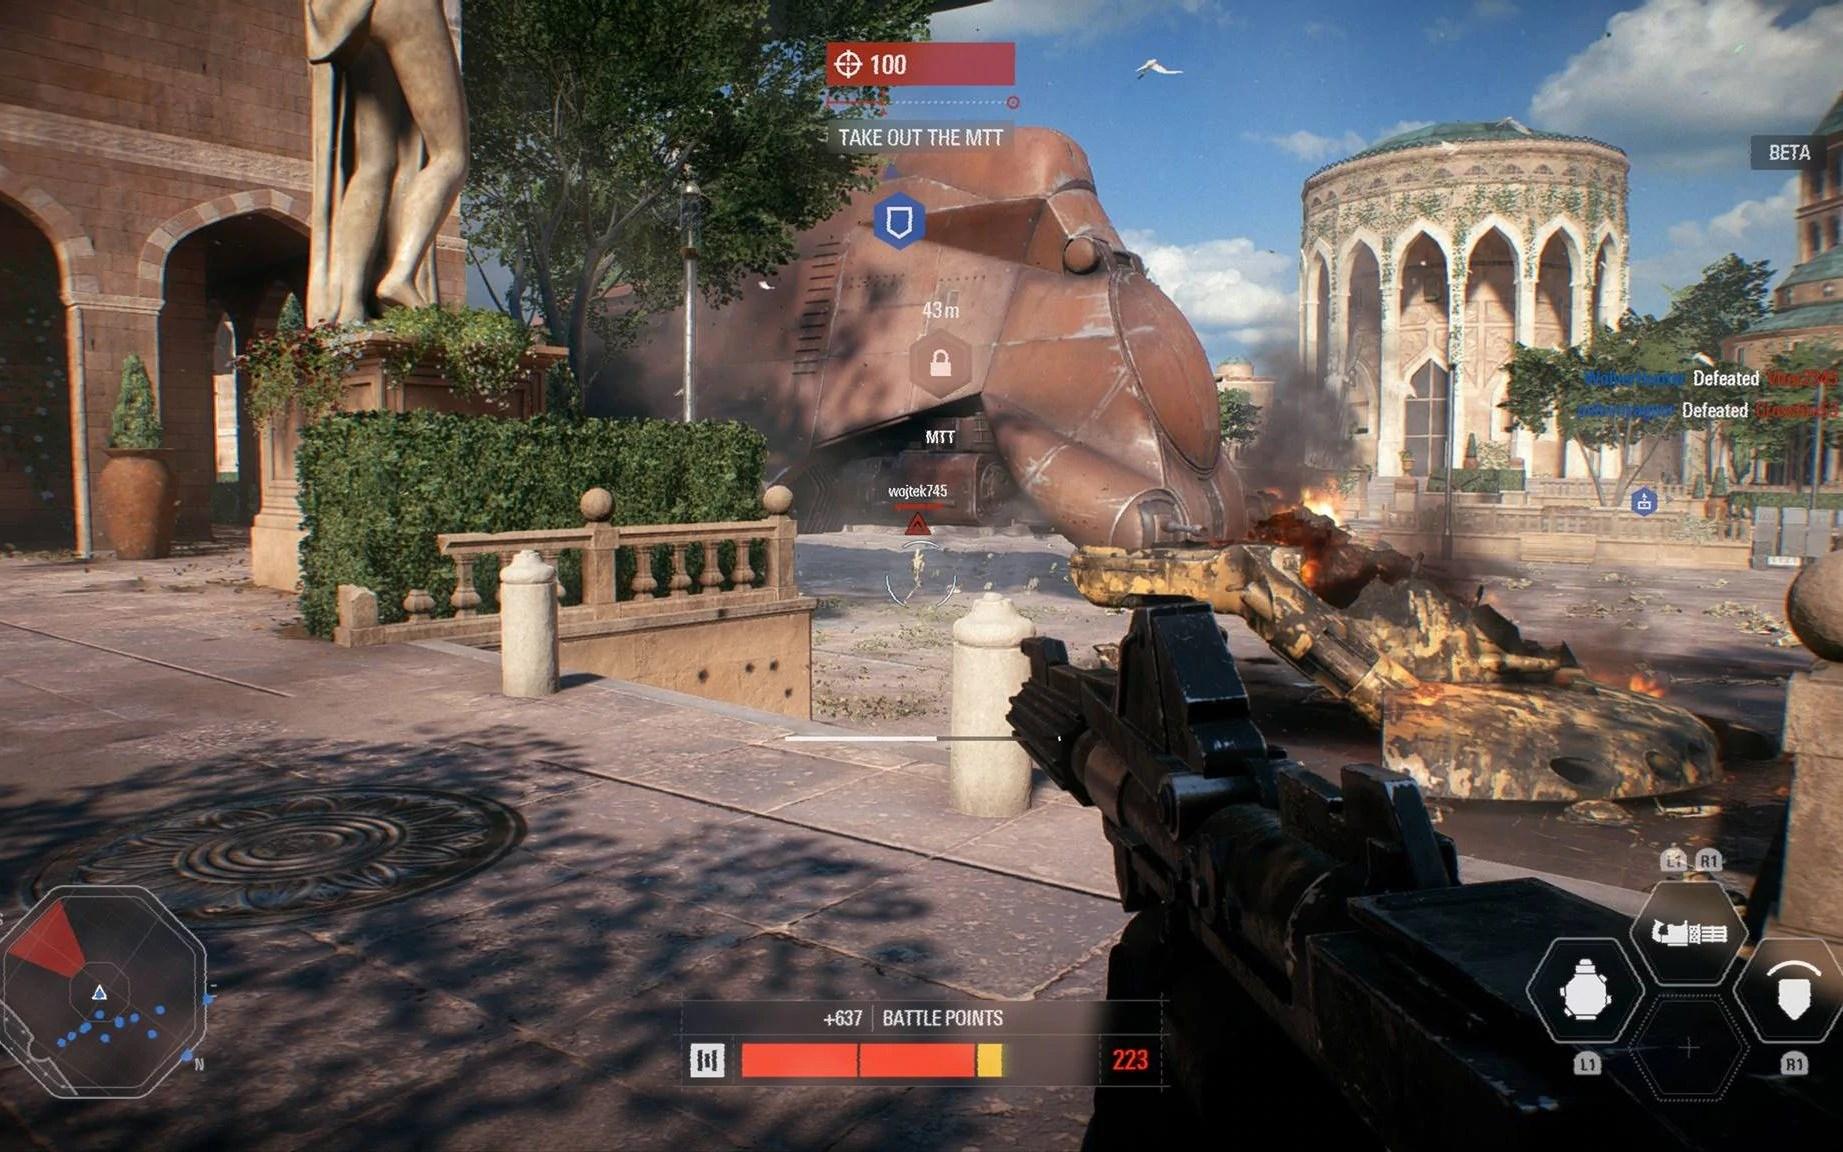 Star Wars Battlefront 2 Multiplayer Tips Your Essential